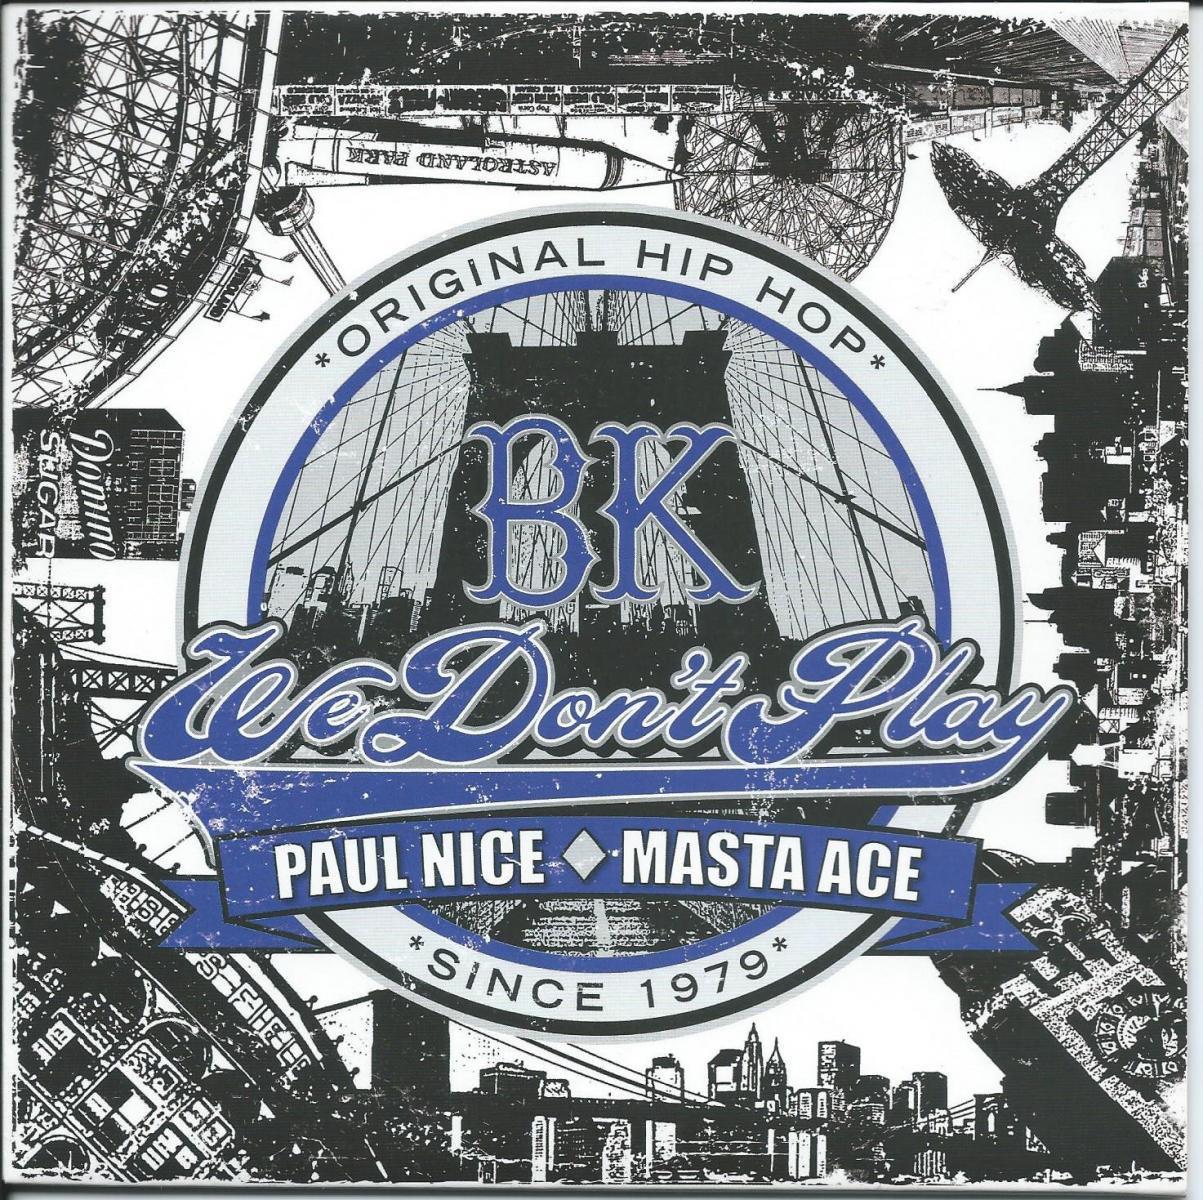 PAUL NICE FEAT. MASTA ACE / BK (WE DON'T PLAY) (7